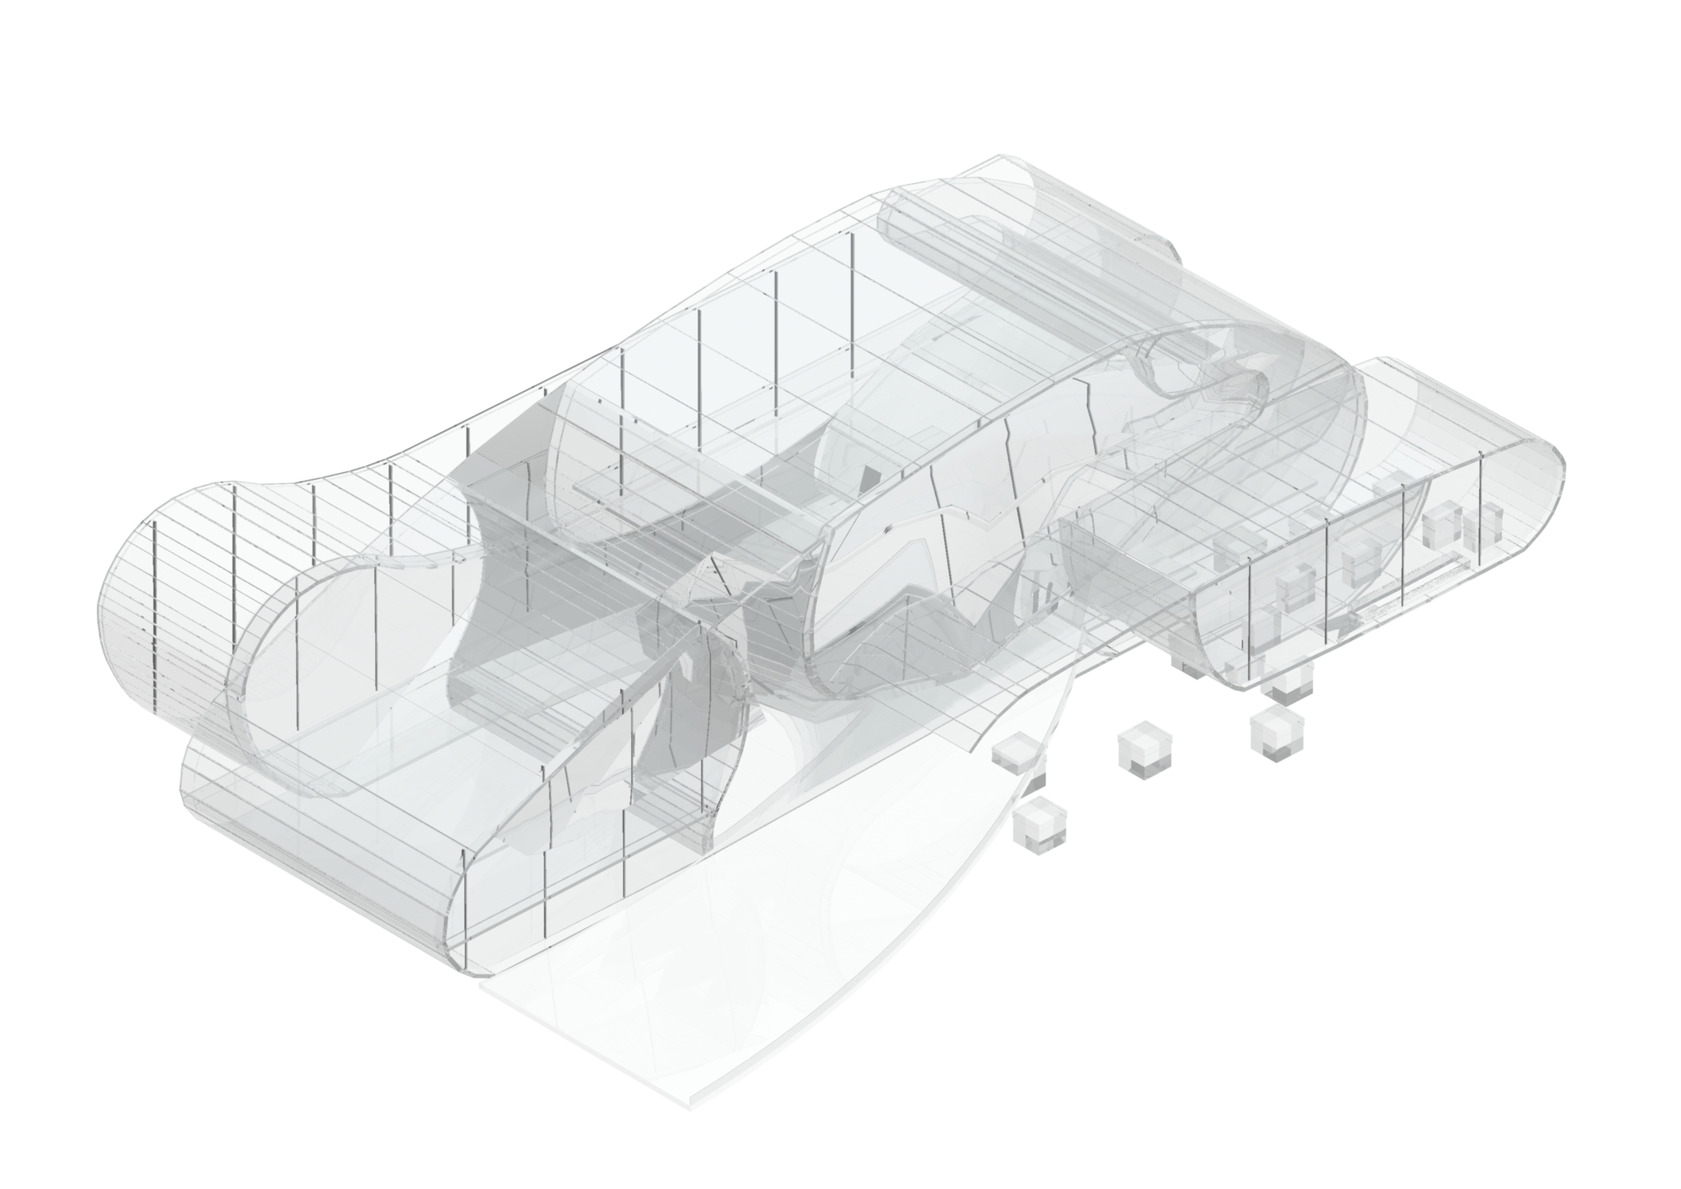 Translucent modern architecture concept